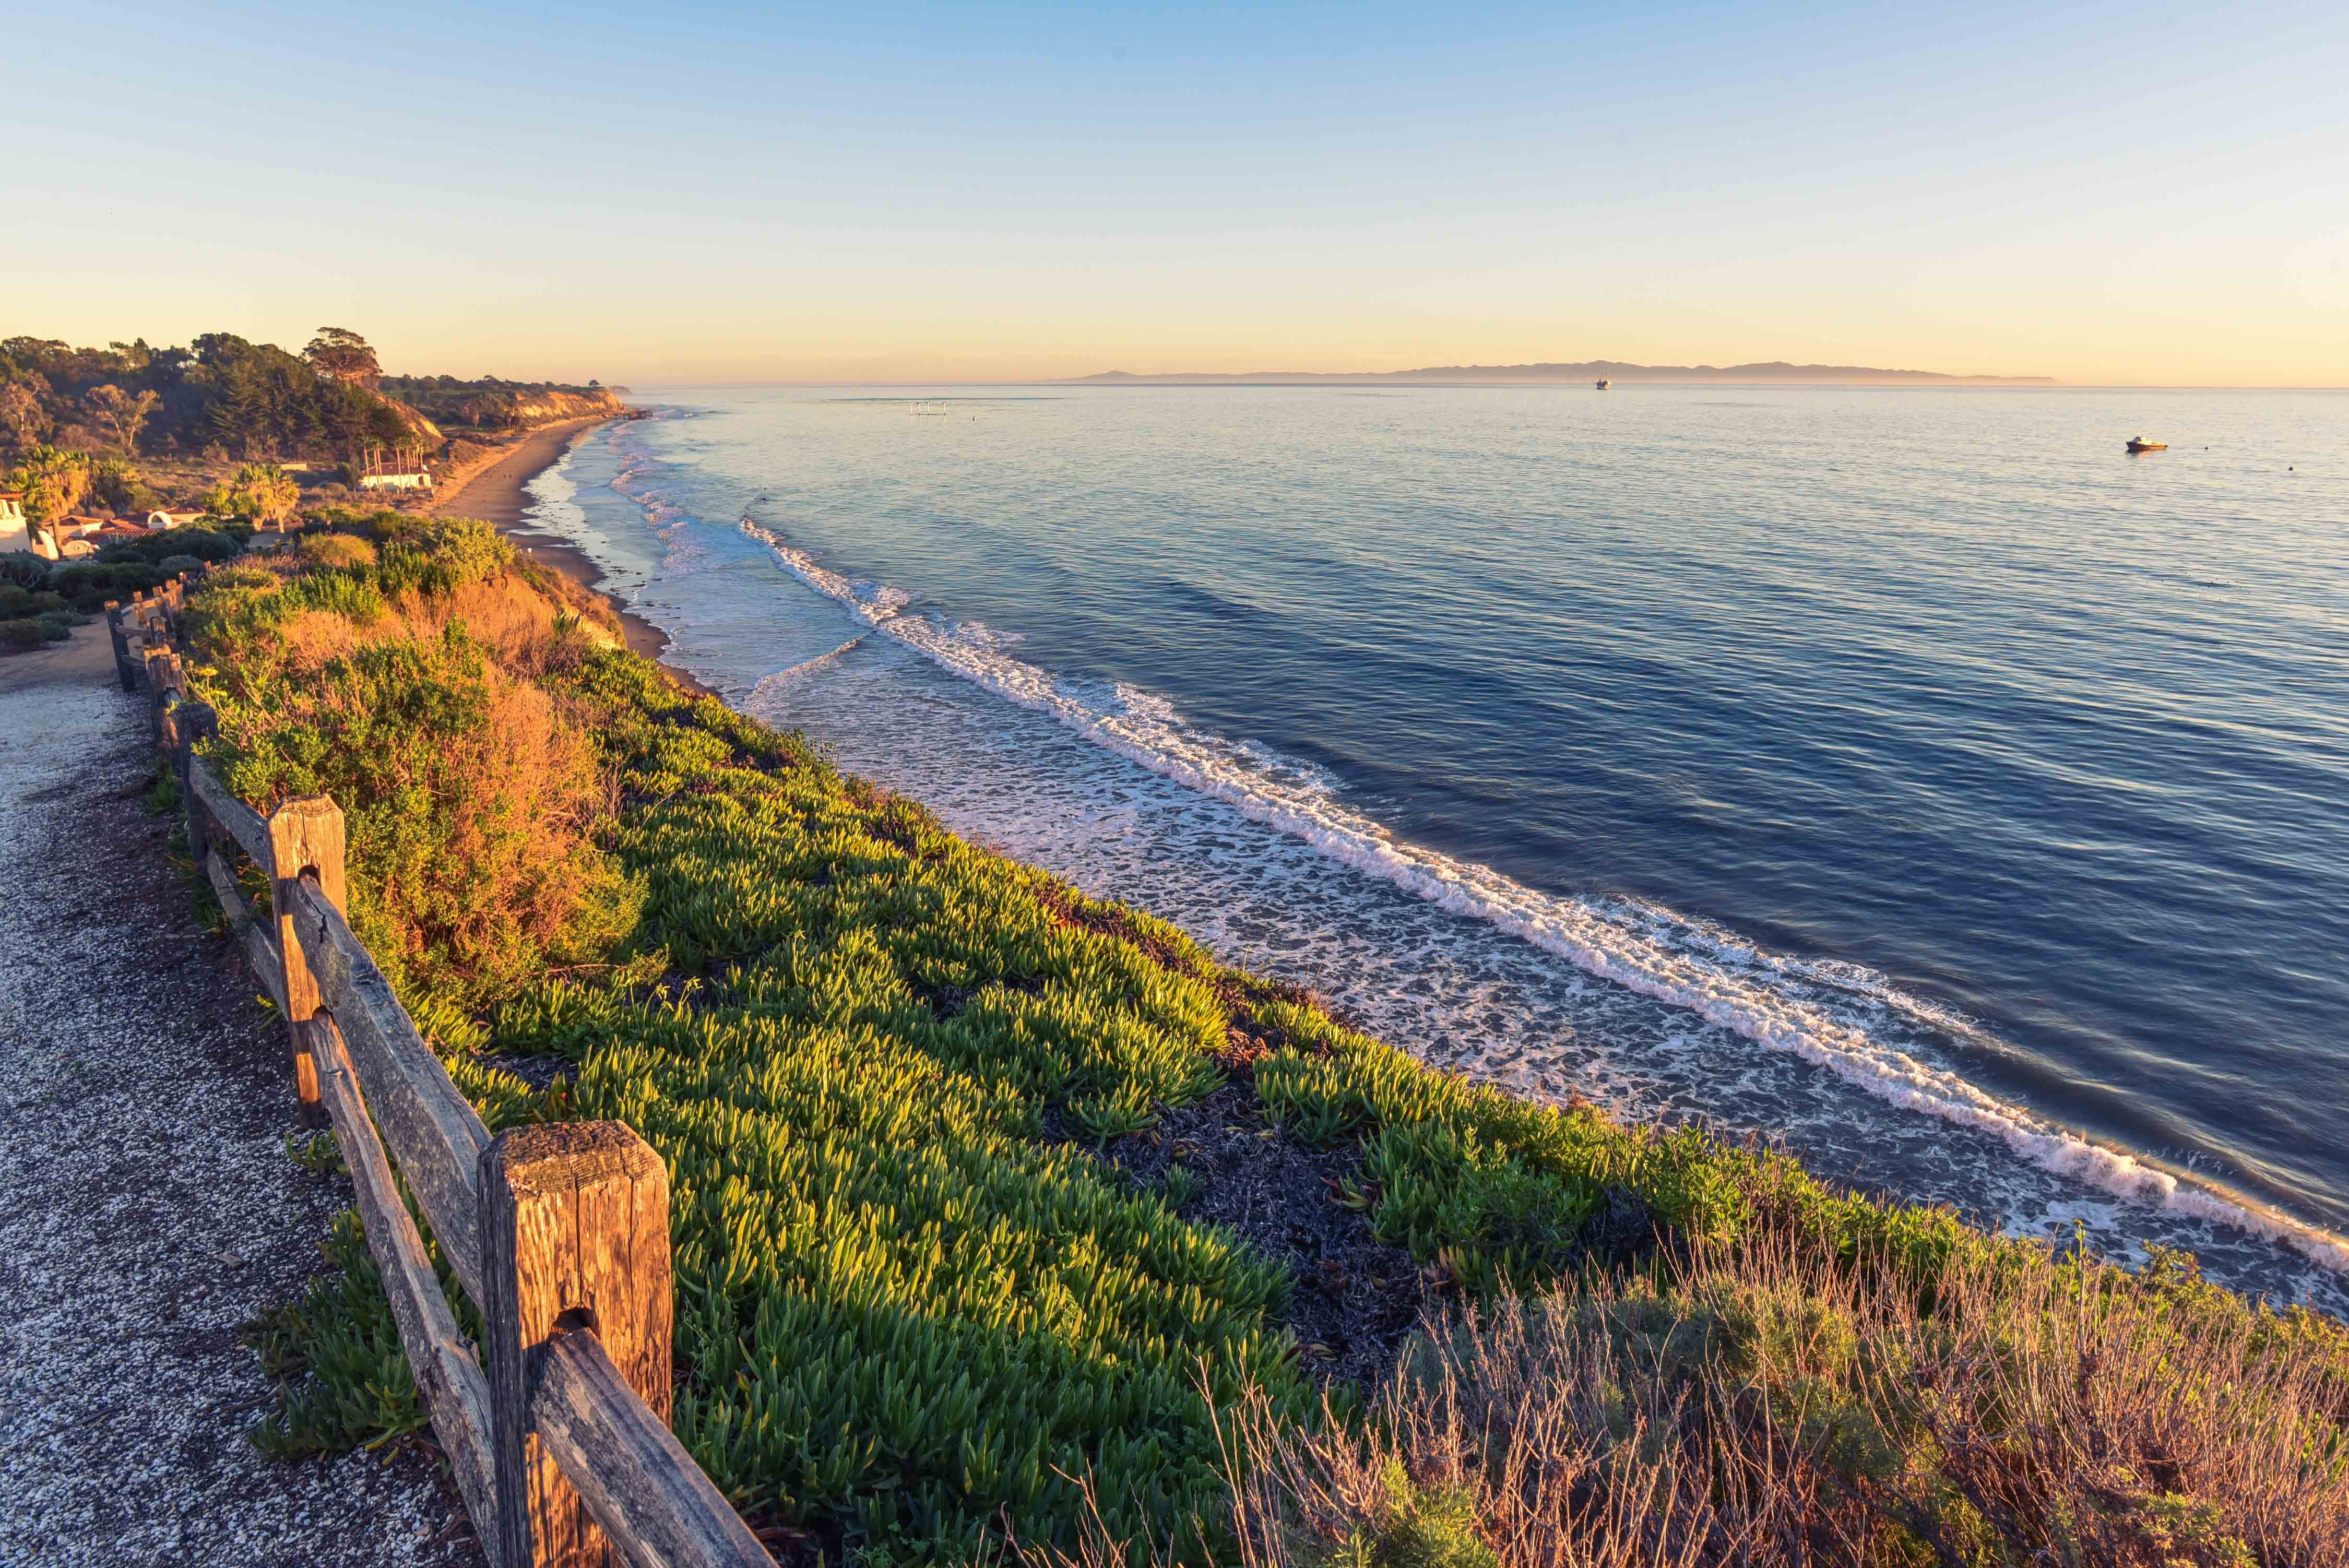 Free stock photo of sea, beach, ocean, waves